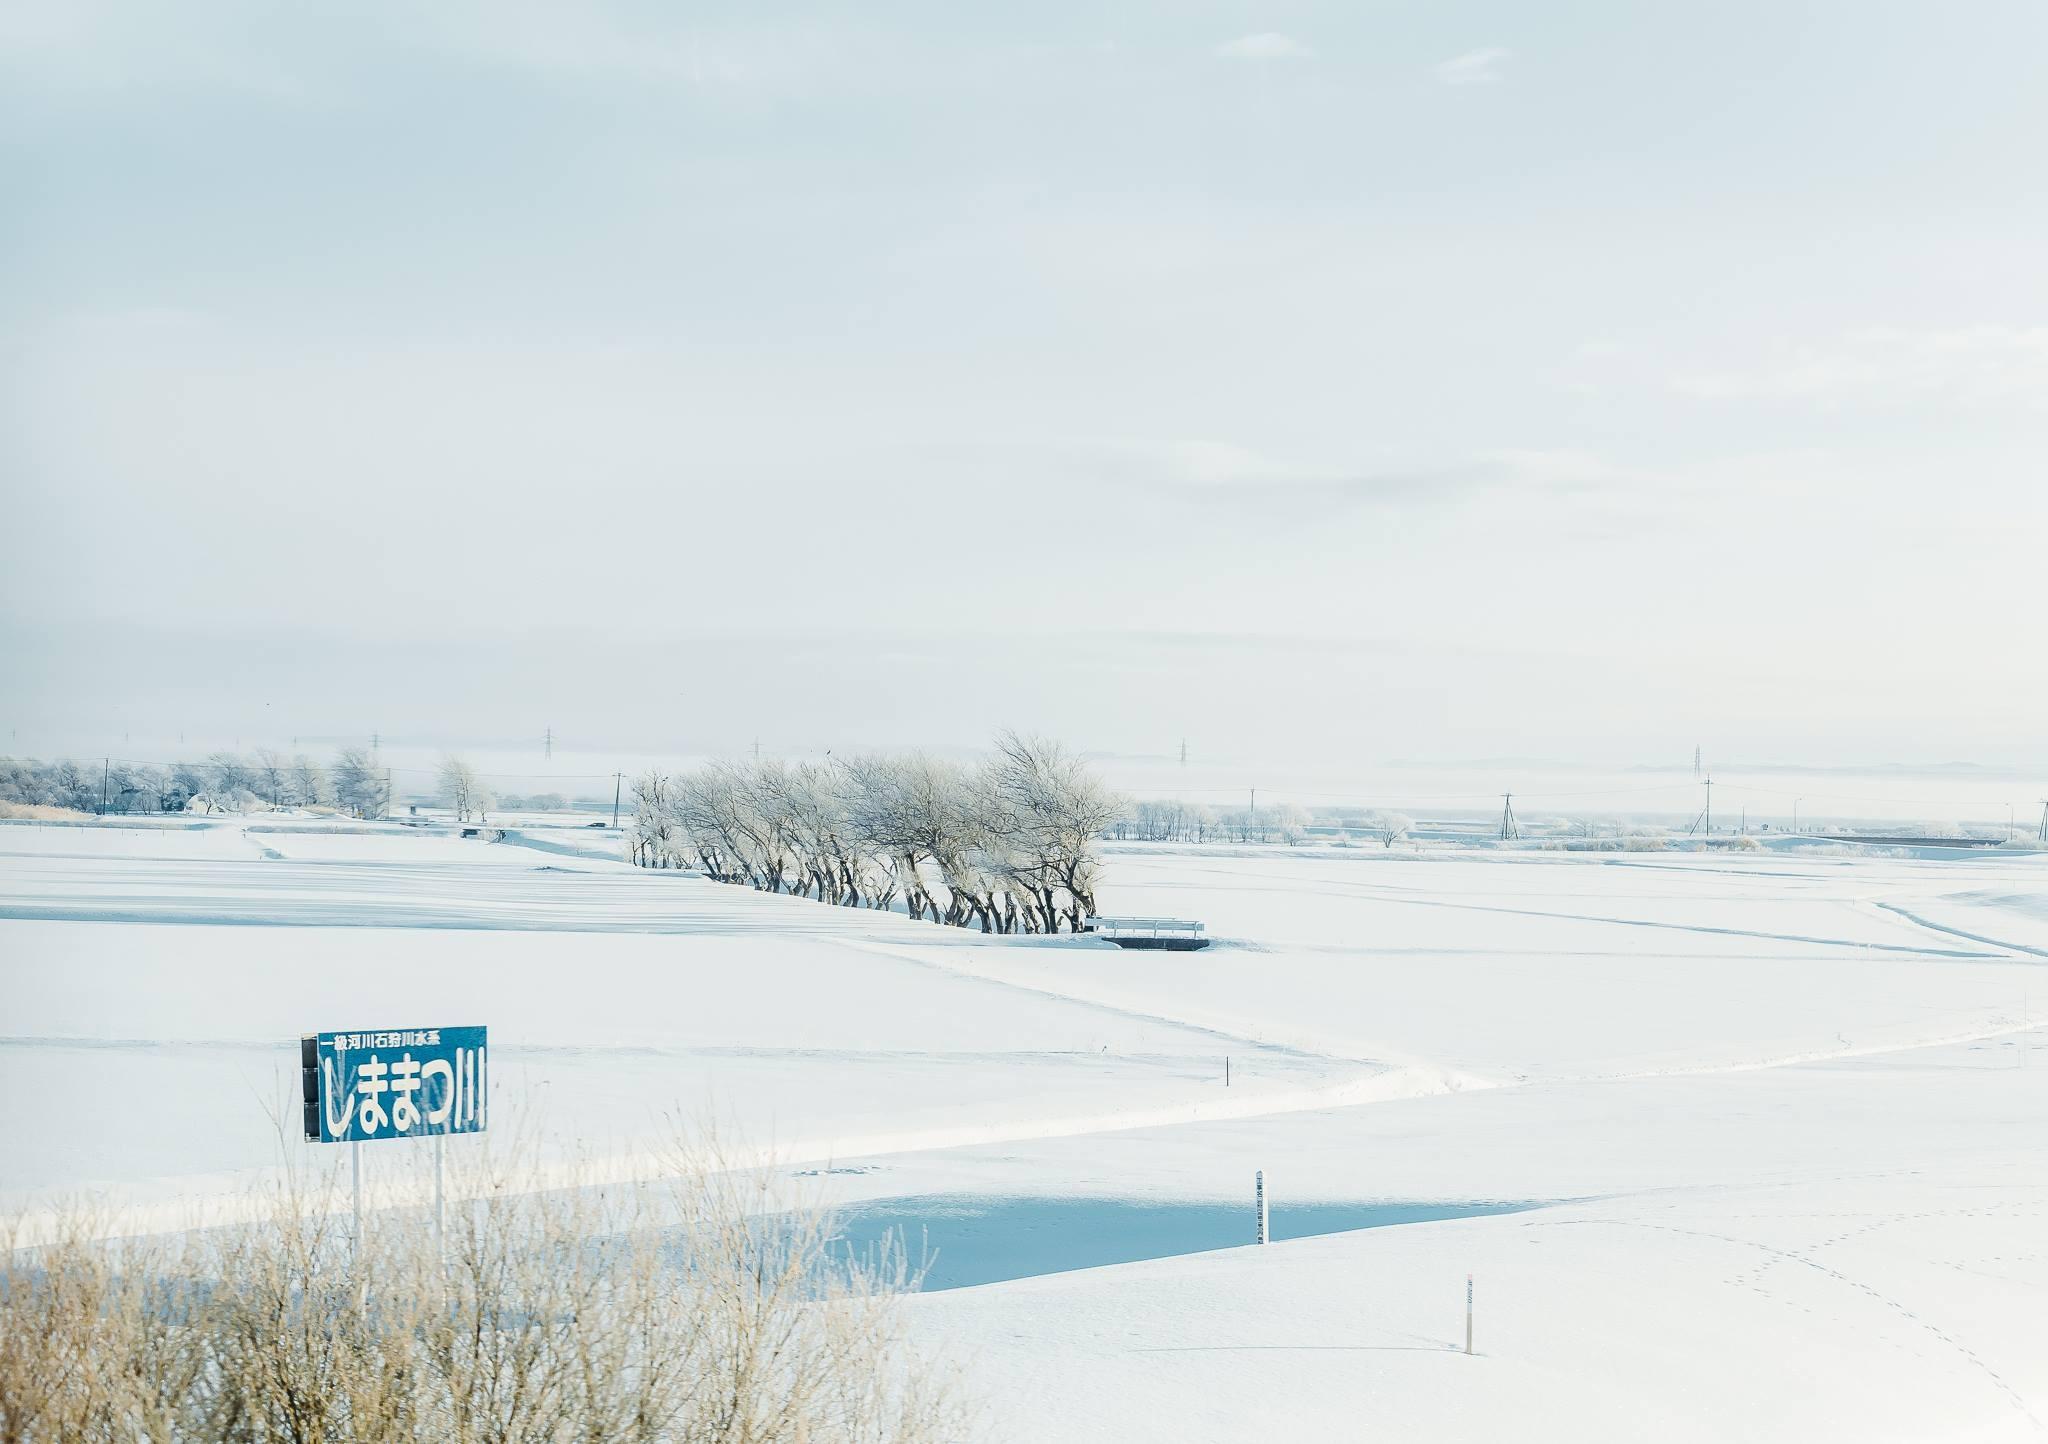 Hokkaido tuyet trang, noi dang den nhat mua dong o Nhat Ban hinh anh 12